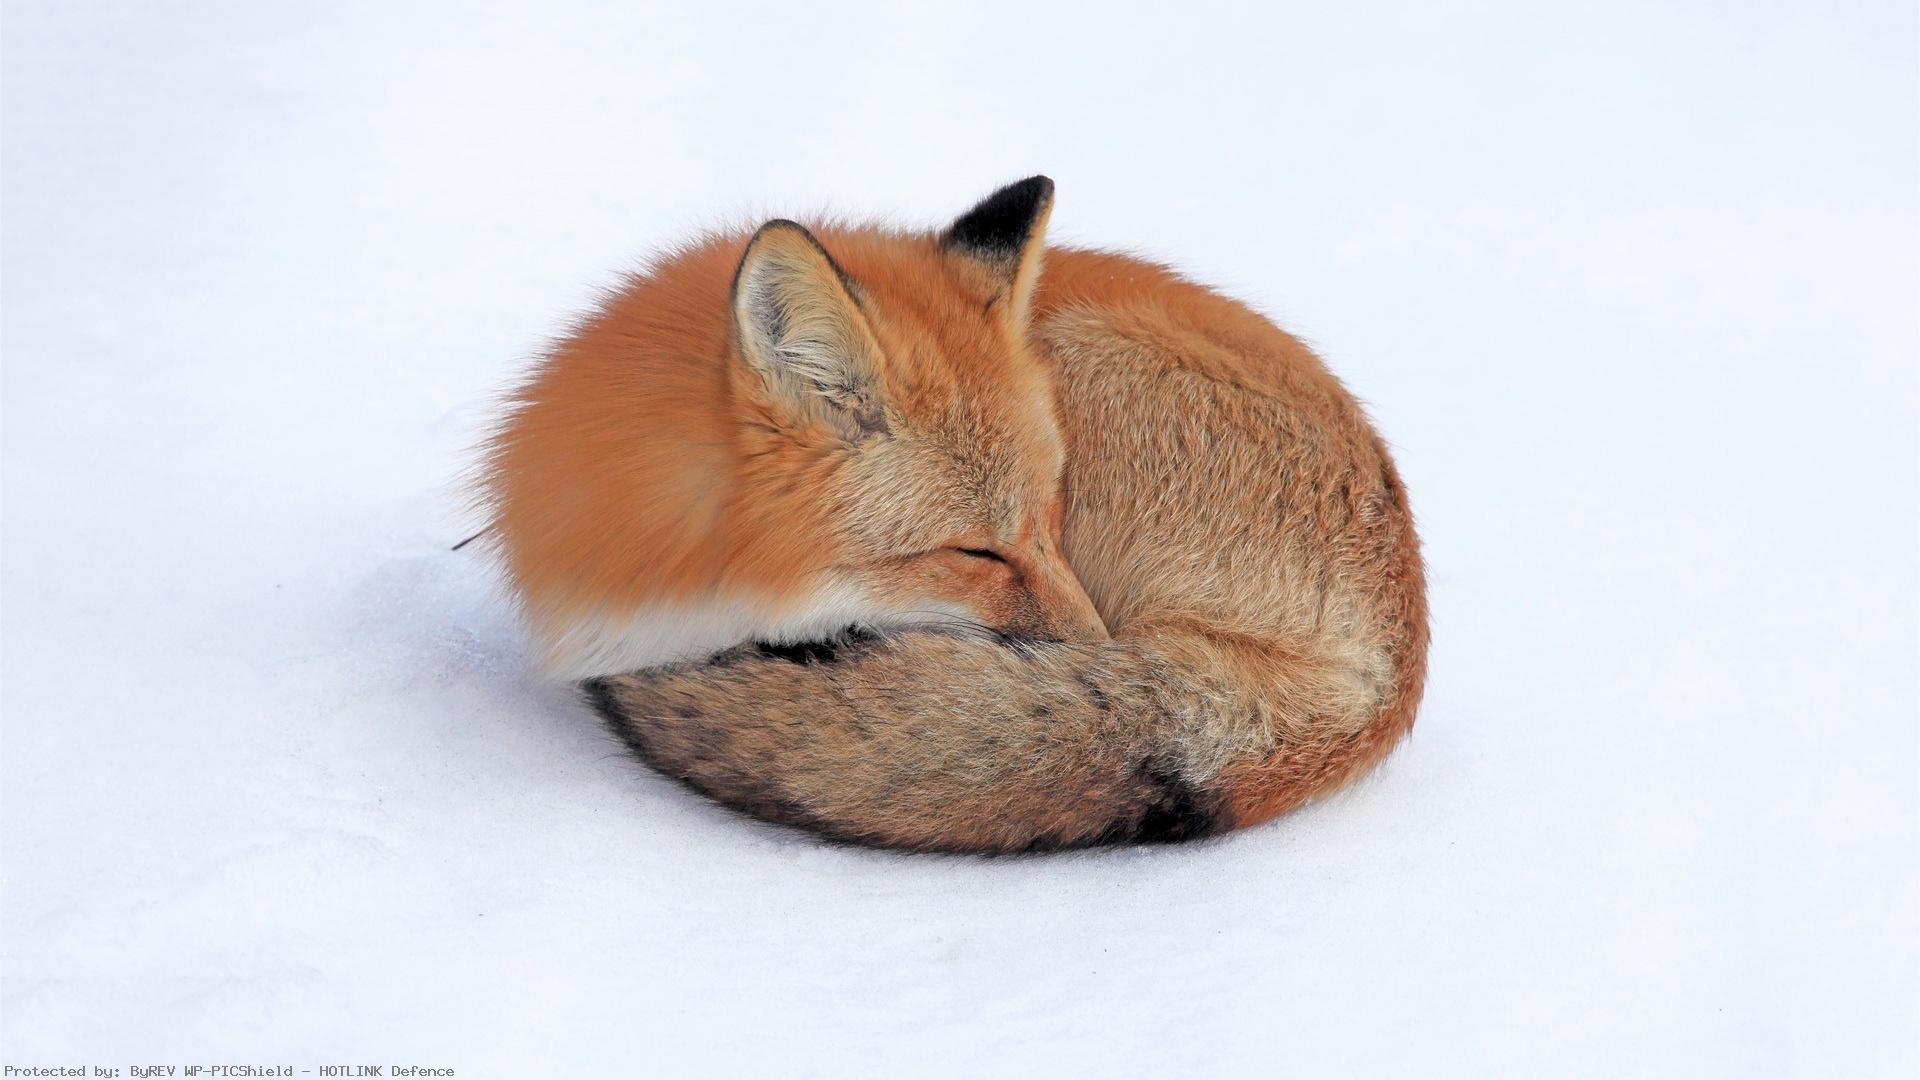 red-fox-sleeping-1920×1080-1920%C3%971080-wallpaper-